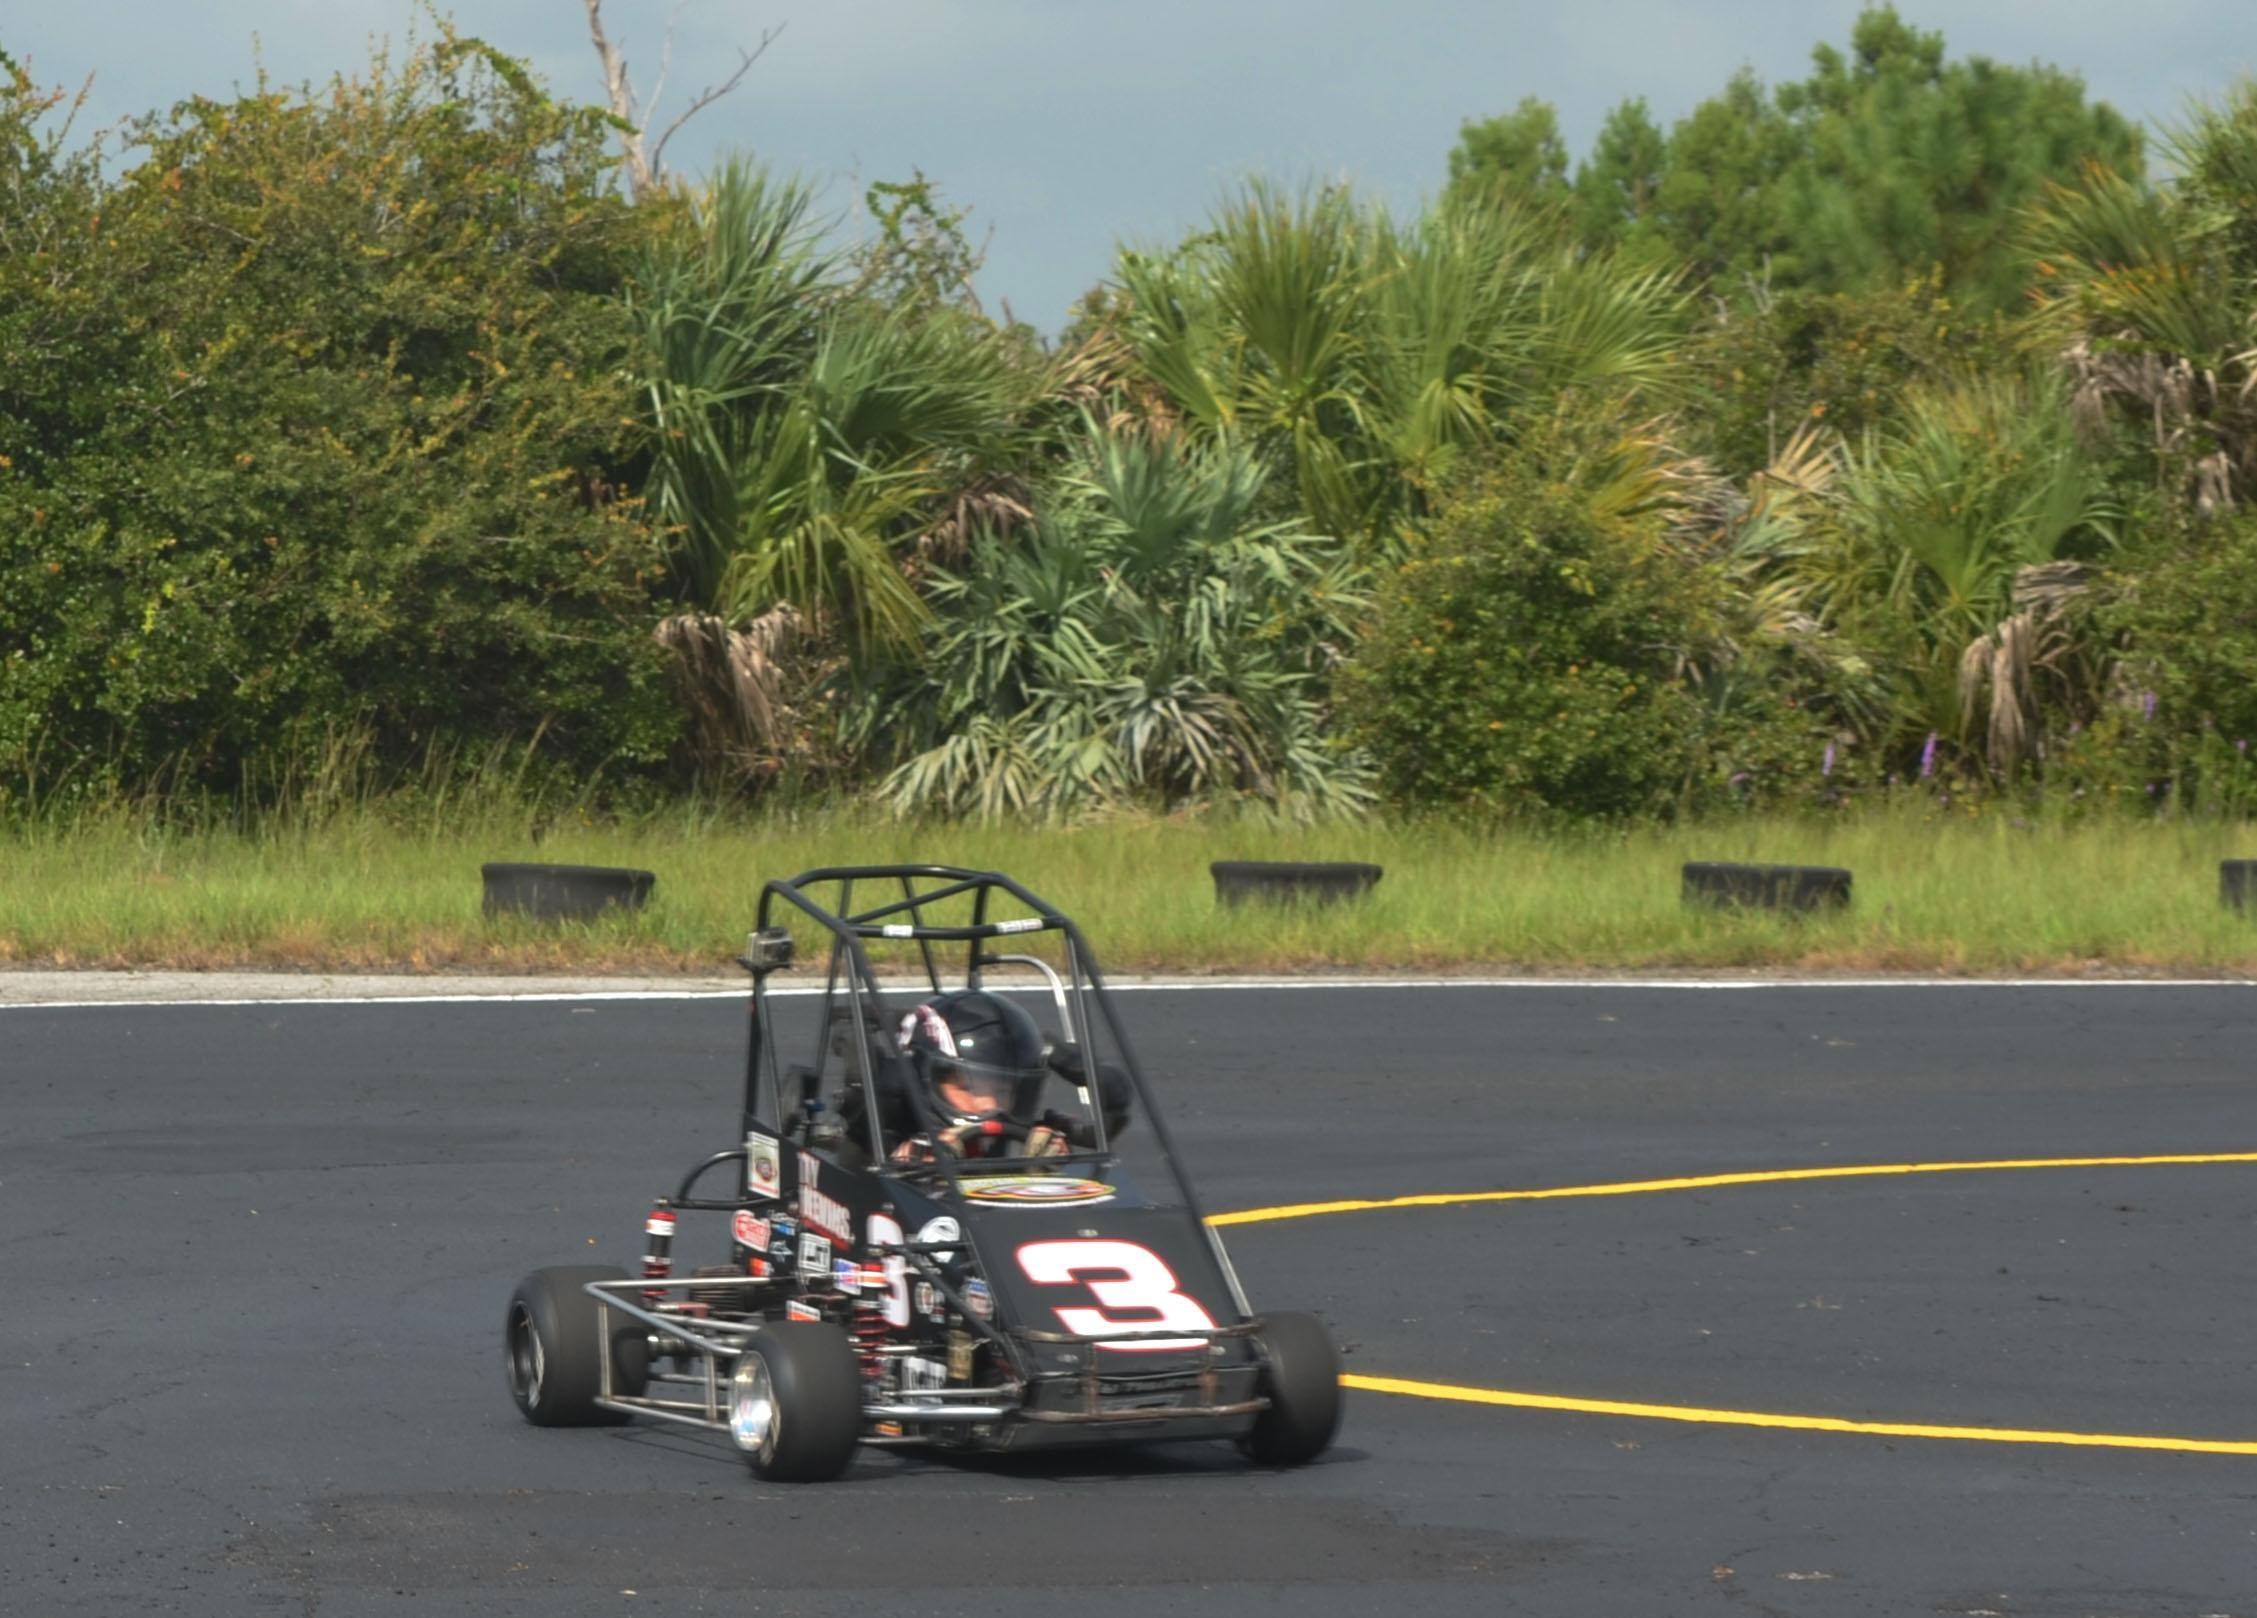 Tampa bay quarter midget racing